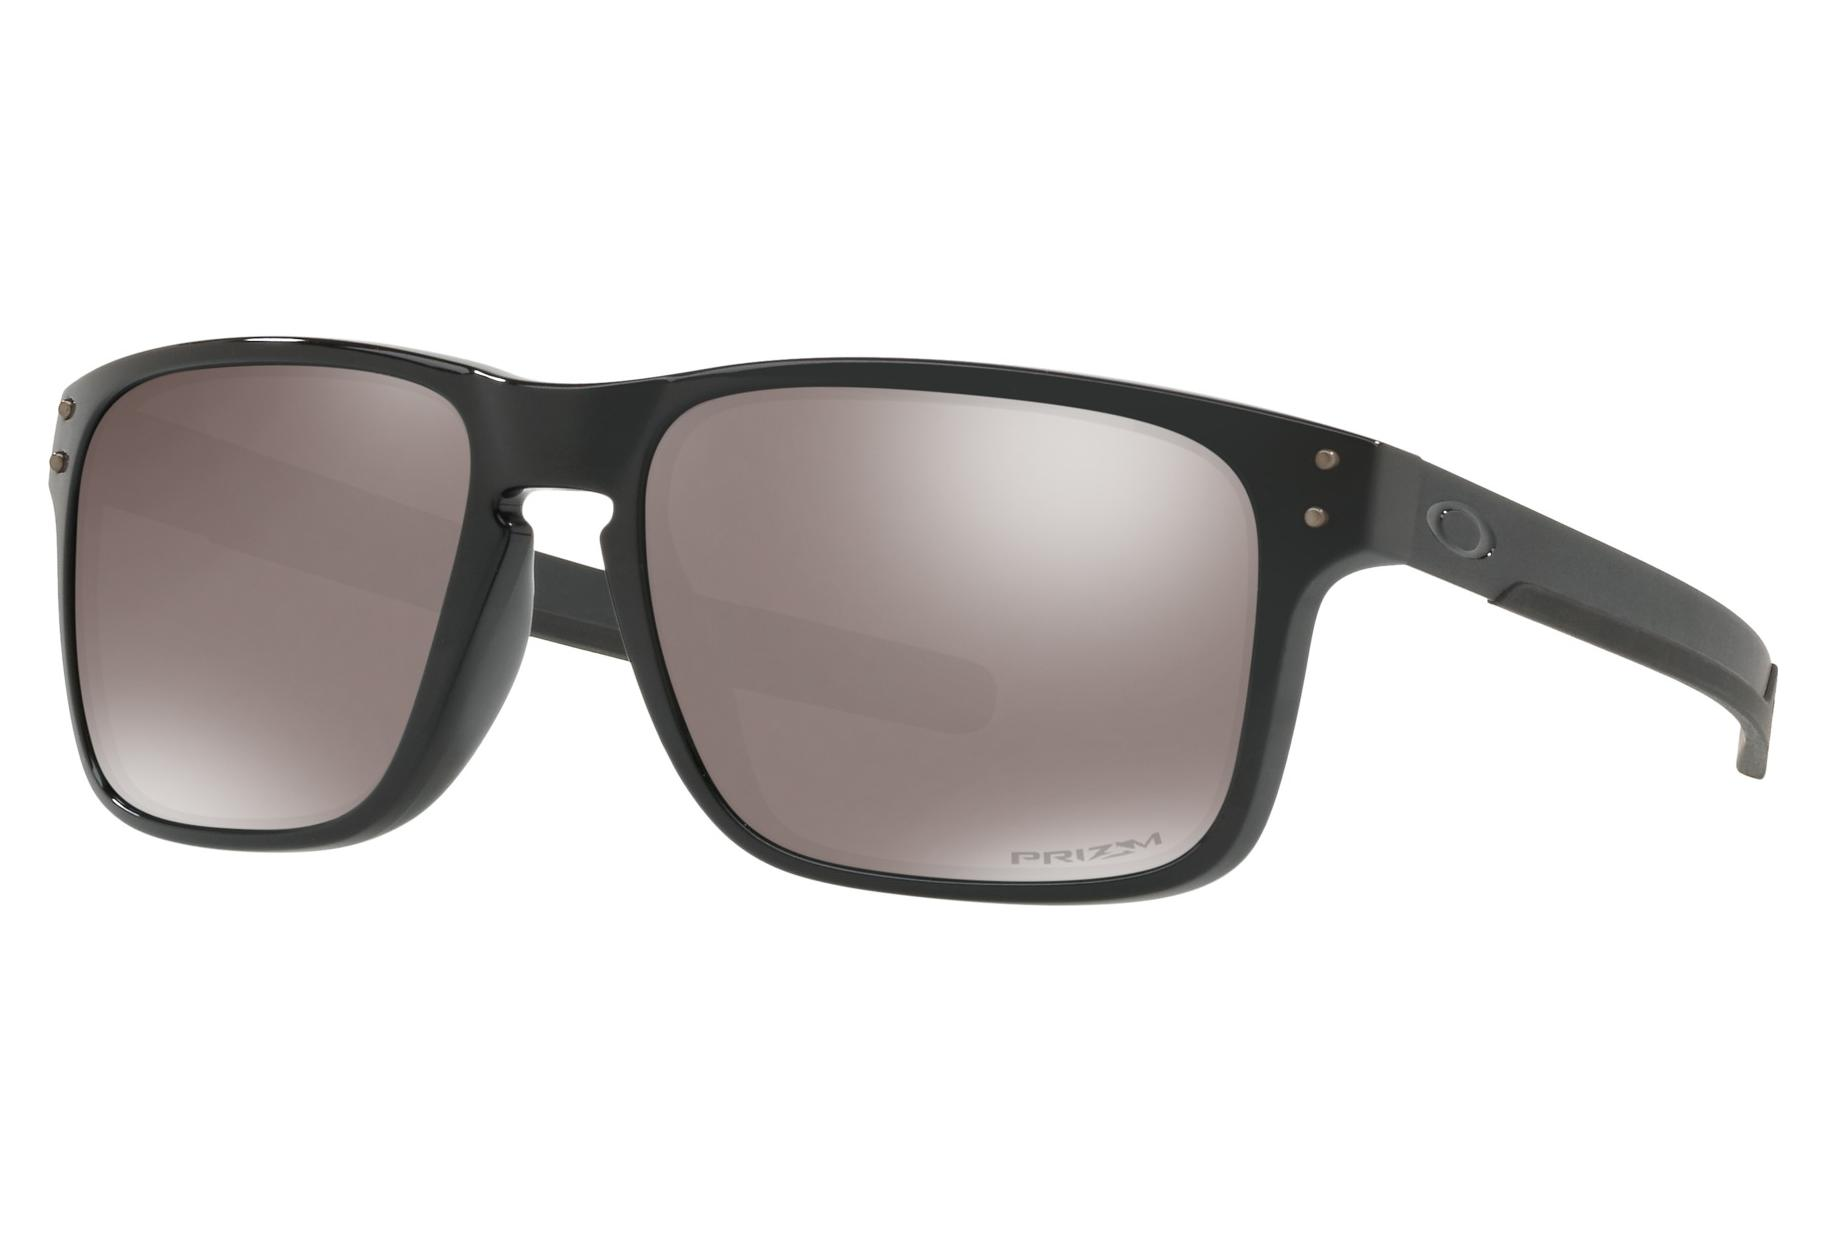 f8f89e71c8 Oakley Sunglasses Holbrook Mix Prizm Black   Polished Black Polarized    Ref. OO9384-0657